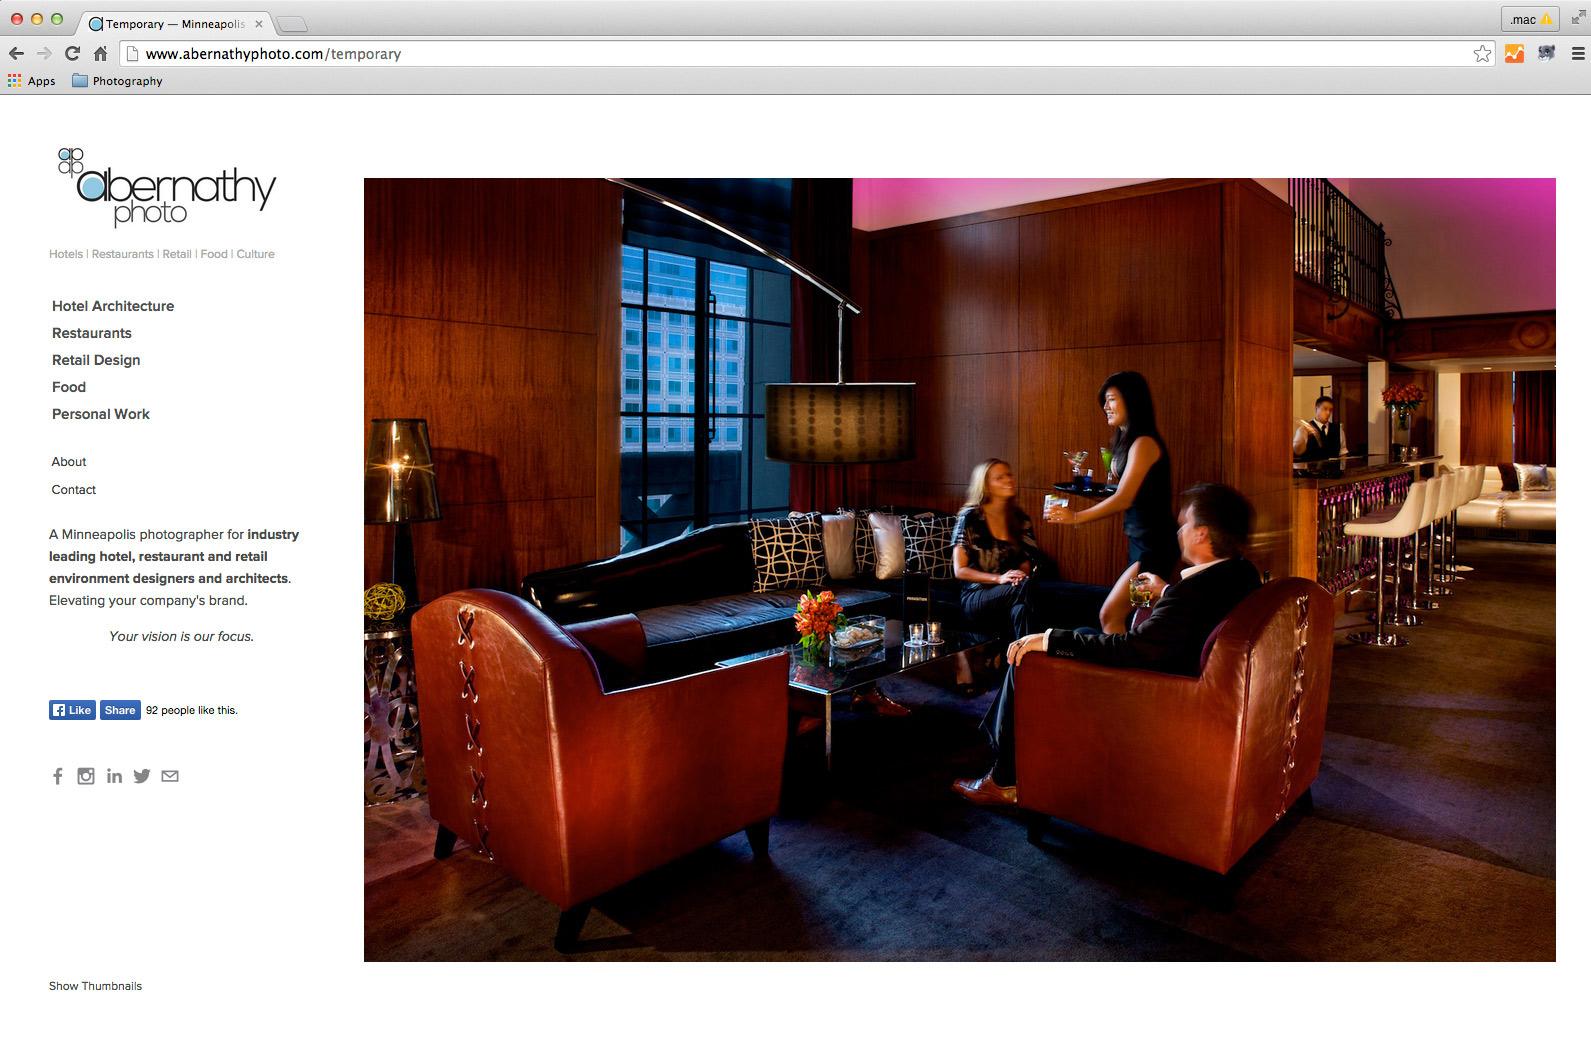 Abernathy Photo - W Hotel